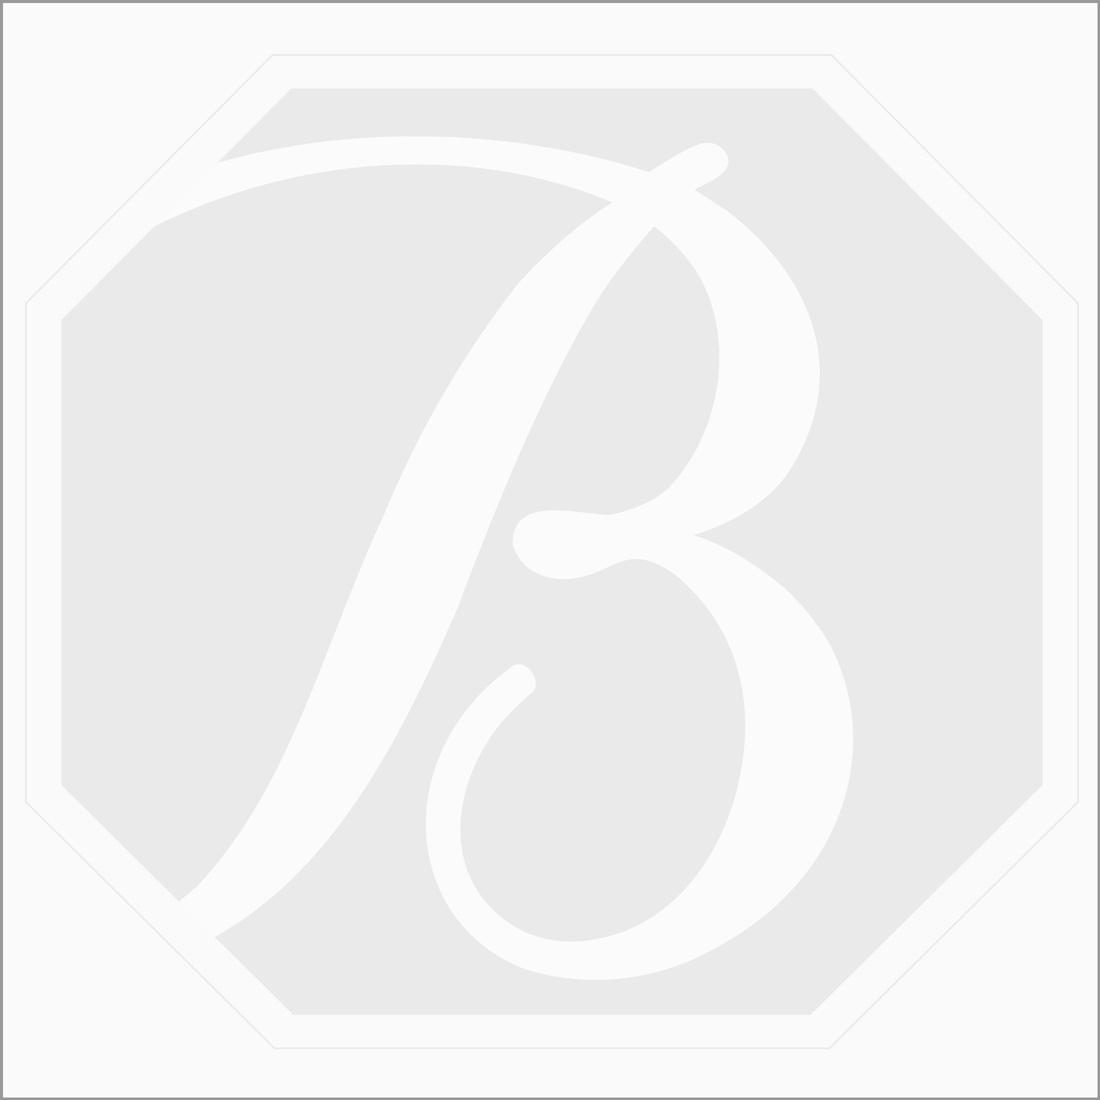 0.59 ct. Oval (G-VS2) White Rose Cut Diamond Photograph